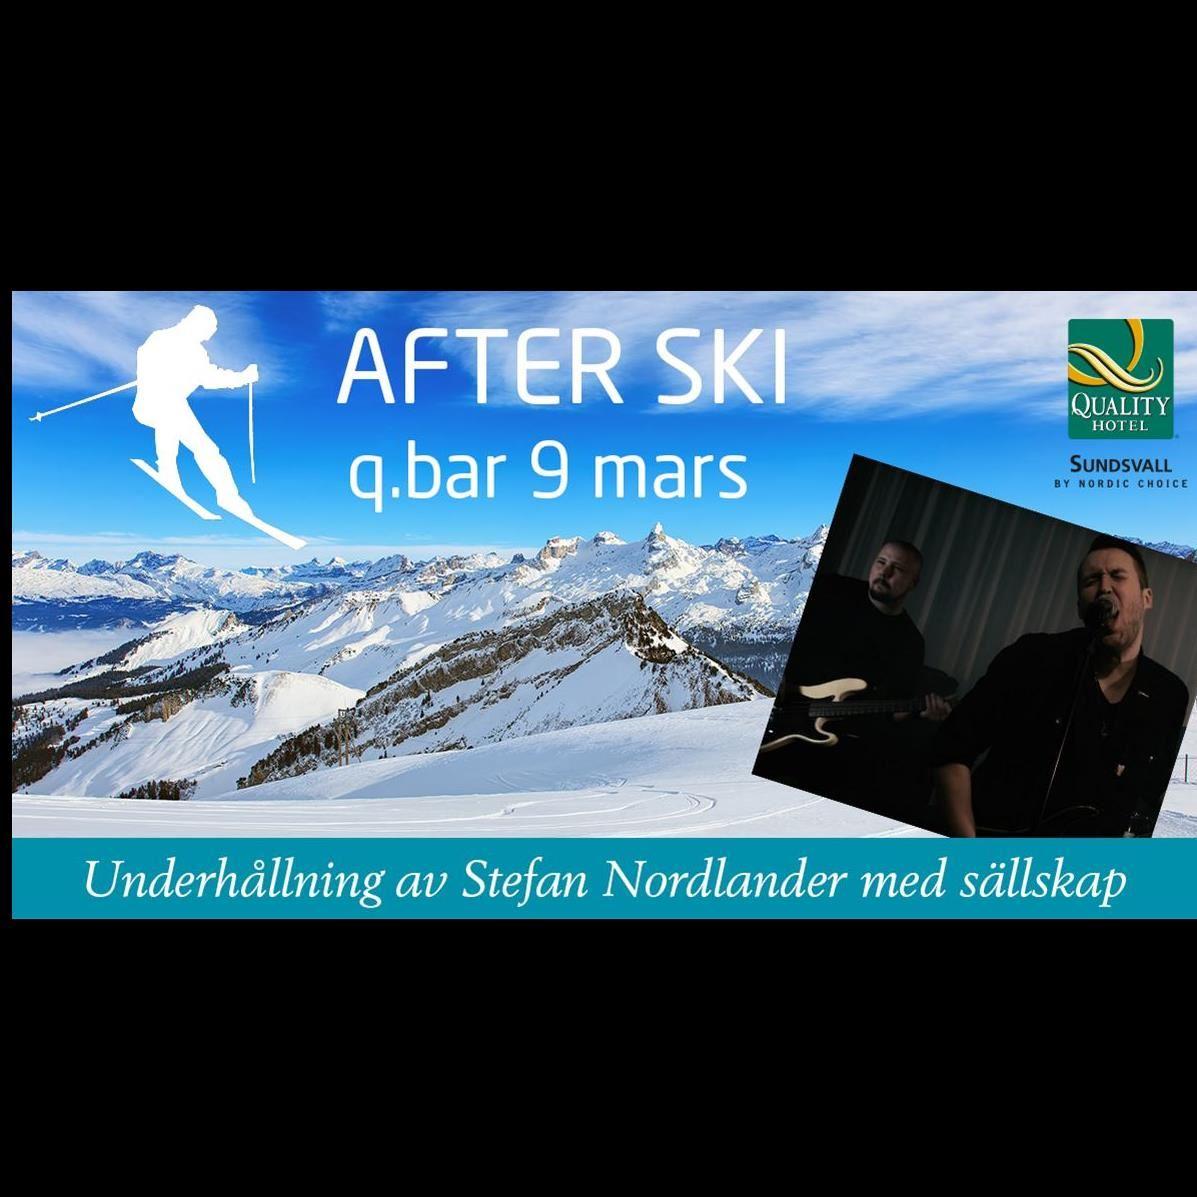 After Ski i q.bar